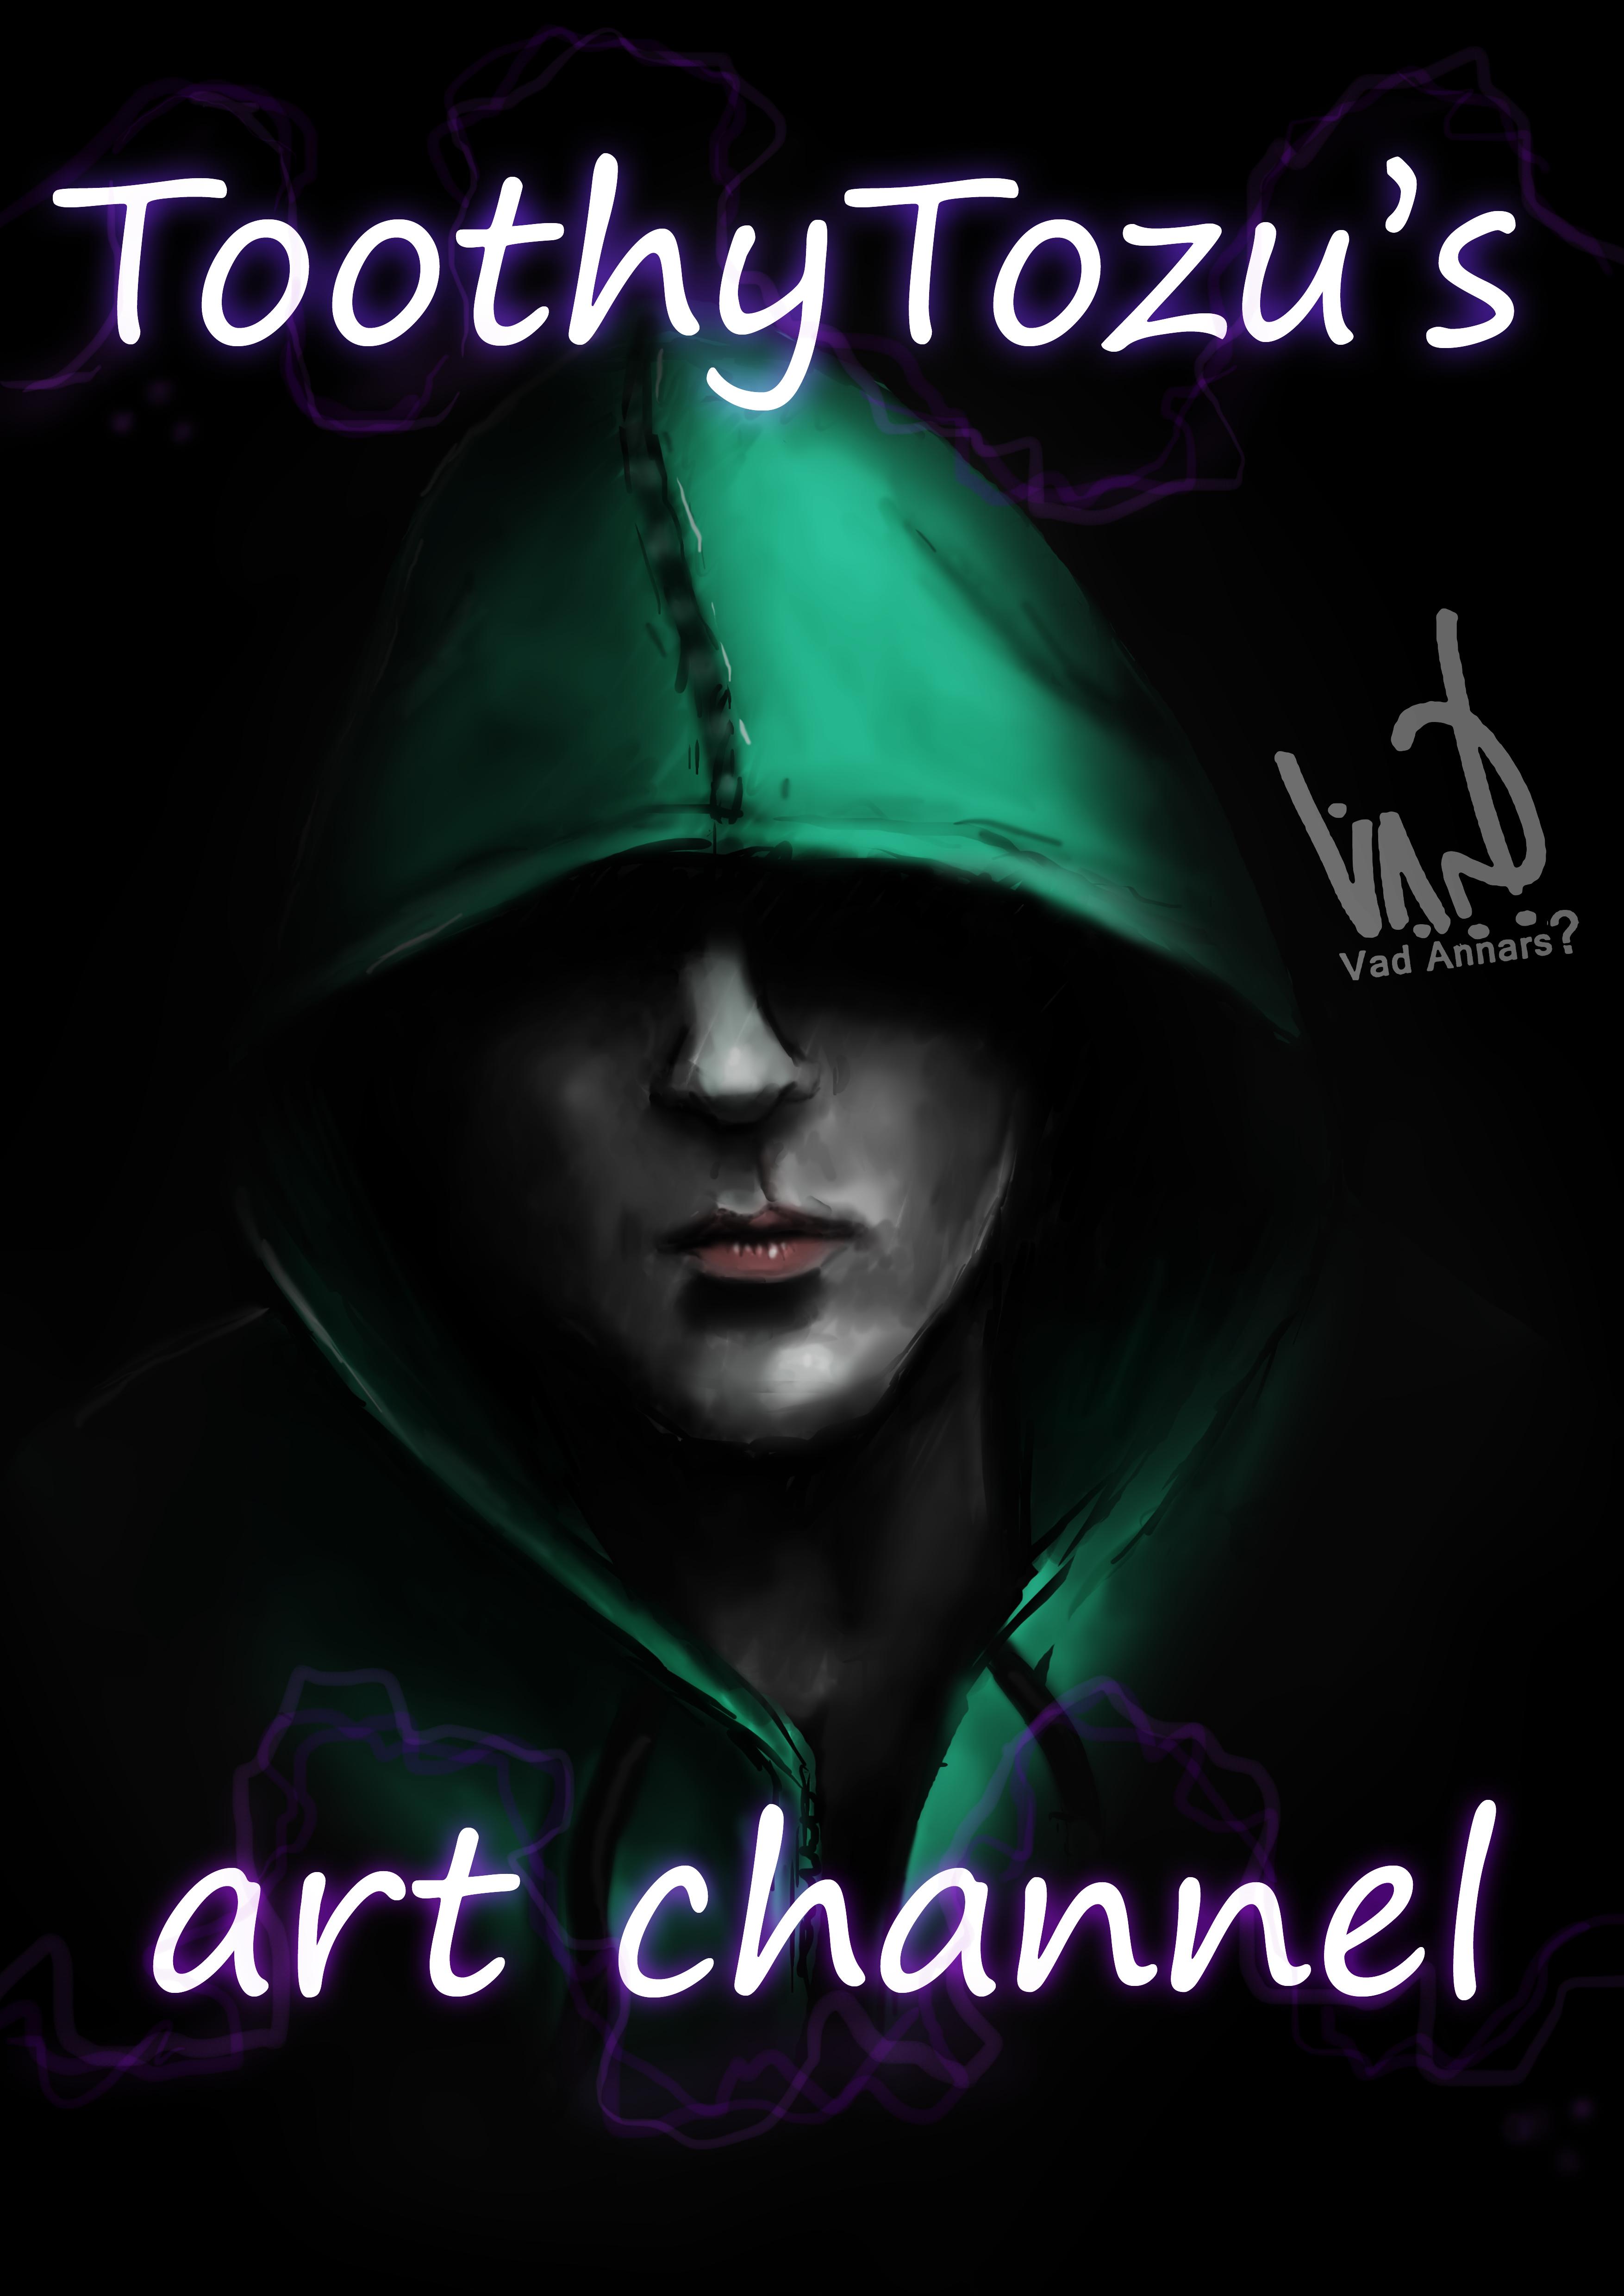 Art channel illustration